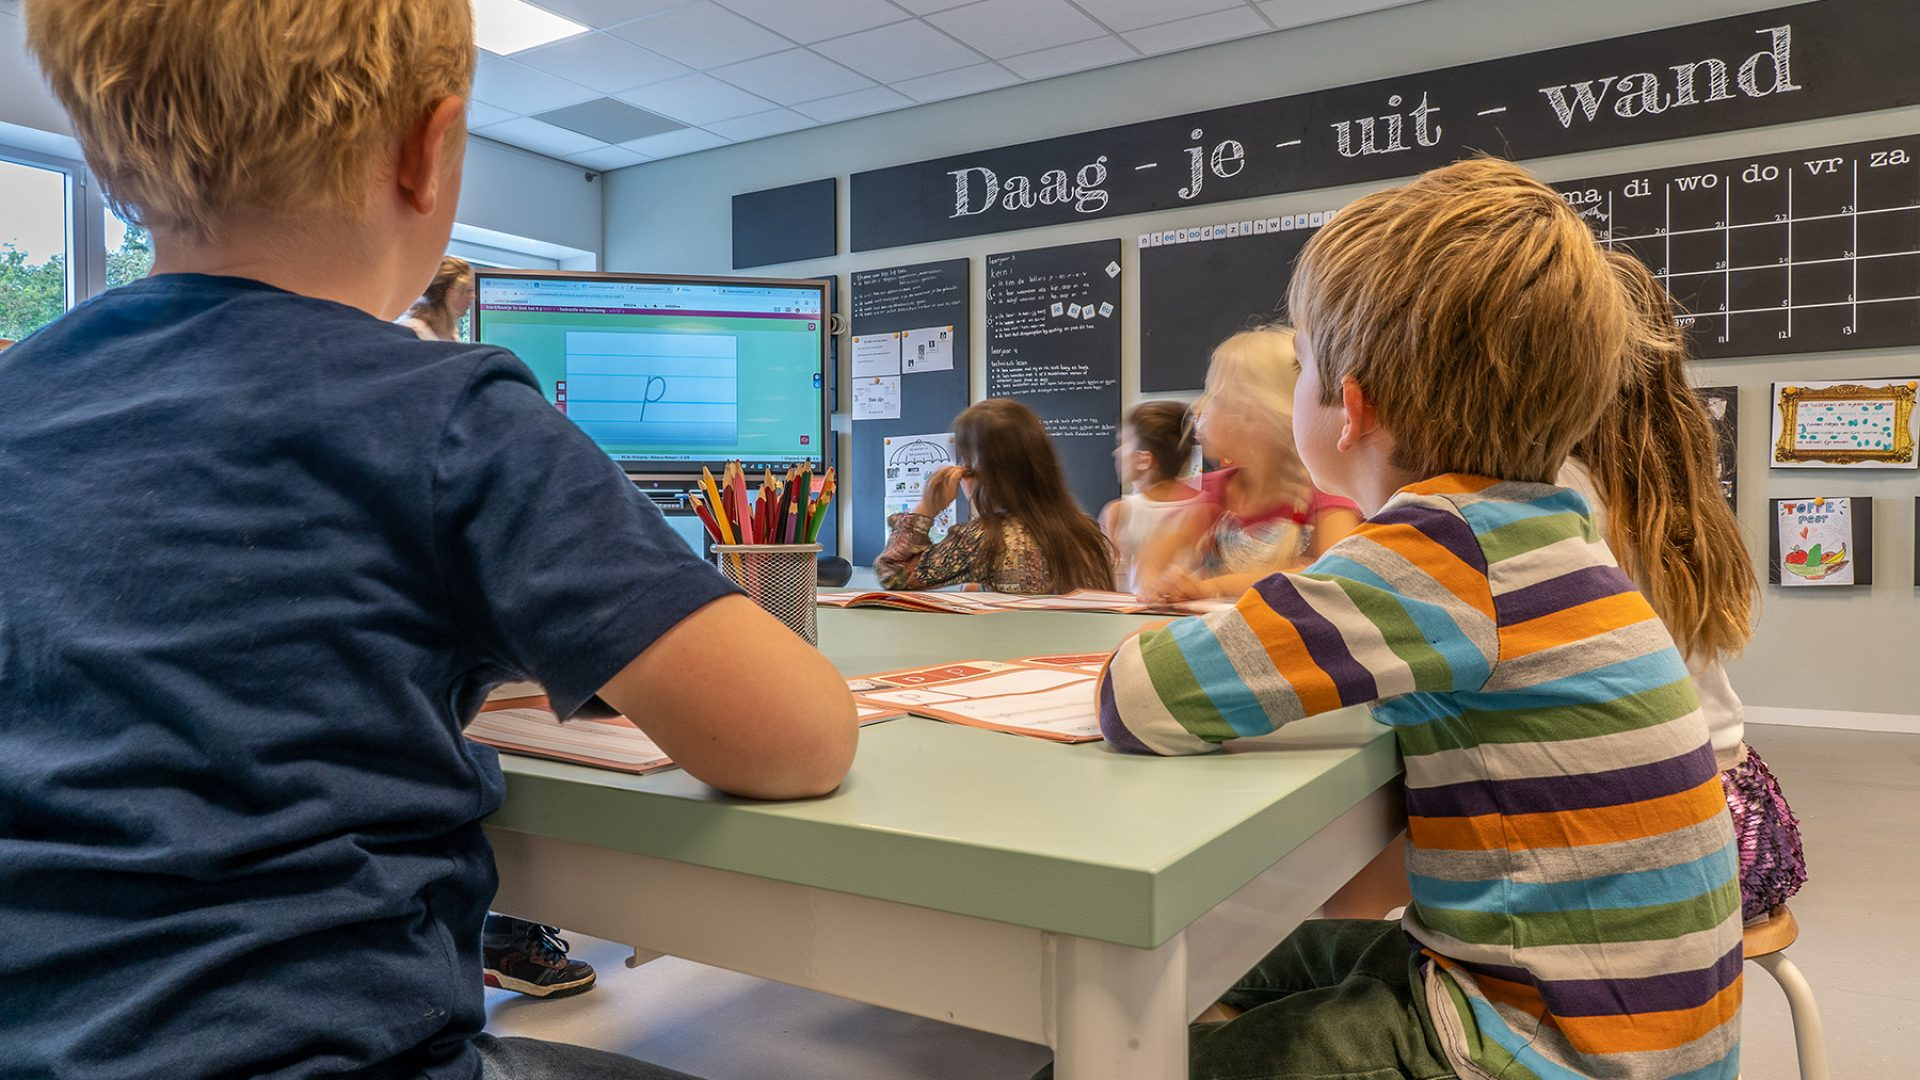 Netherlands: Should You Choose It for Future Studies?